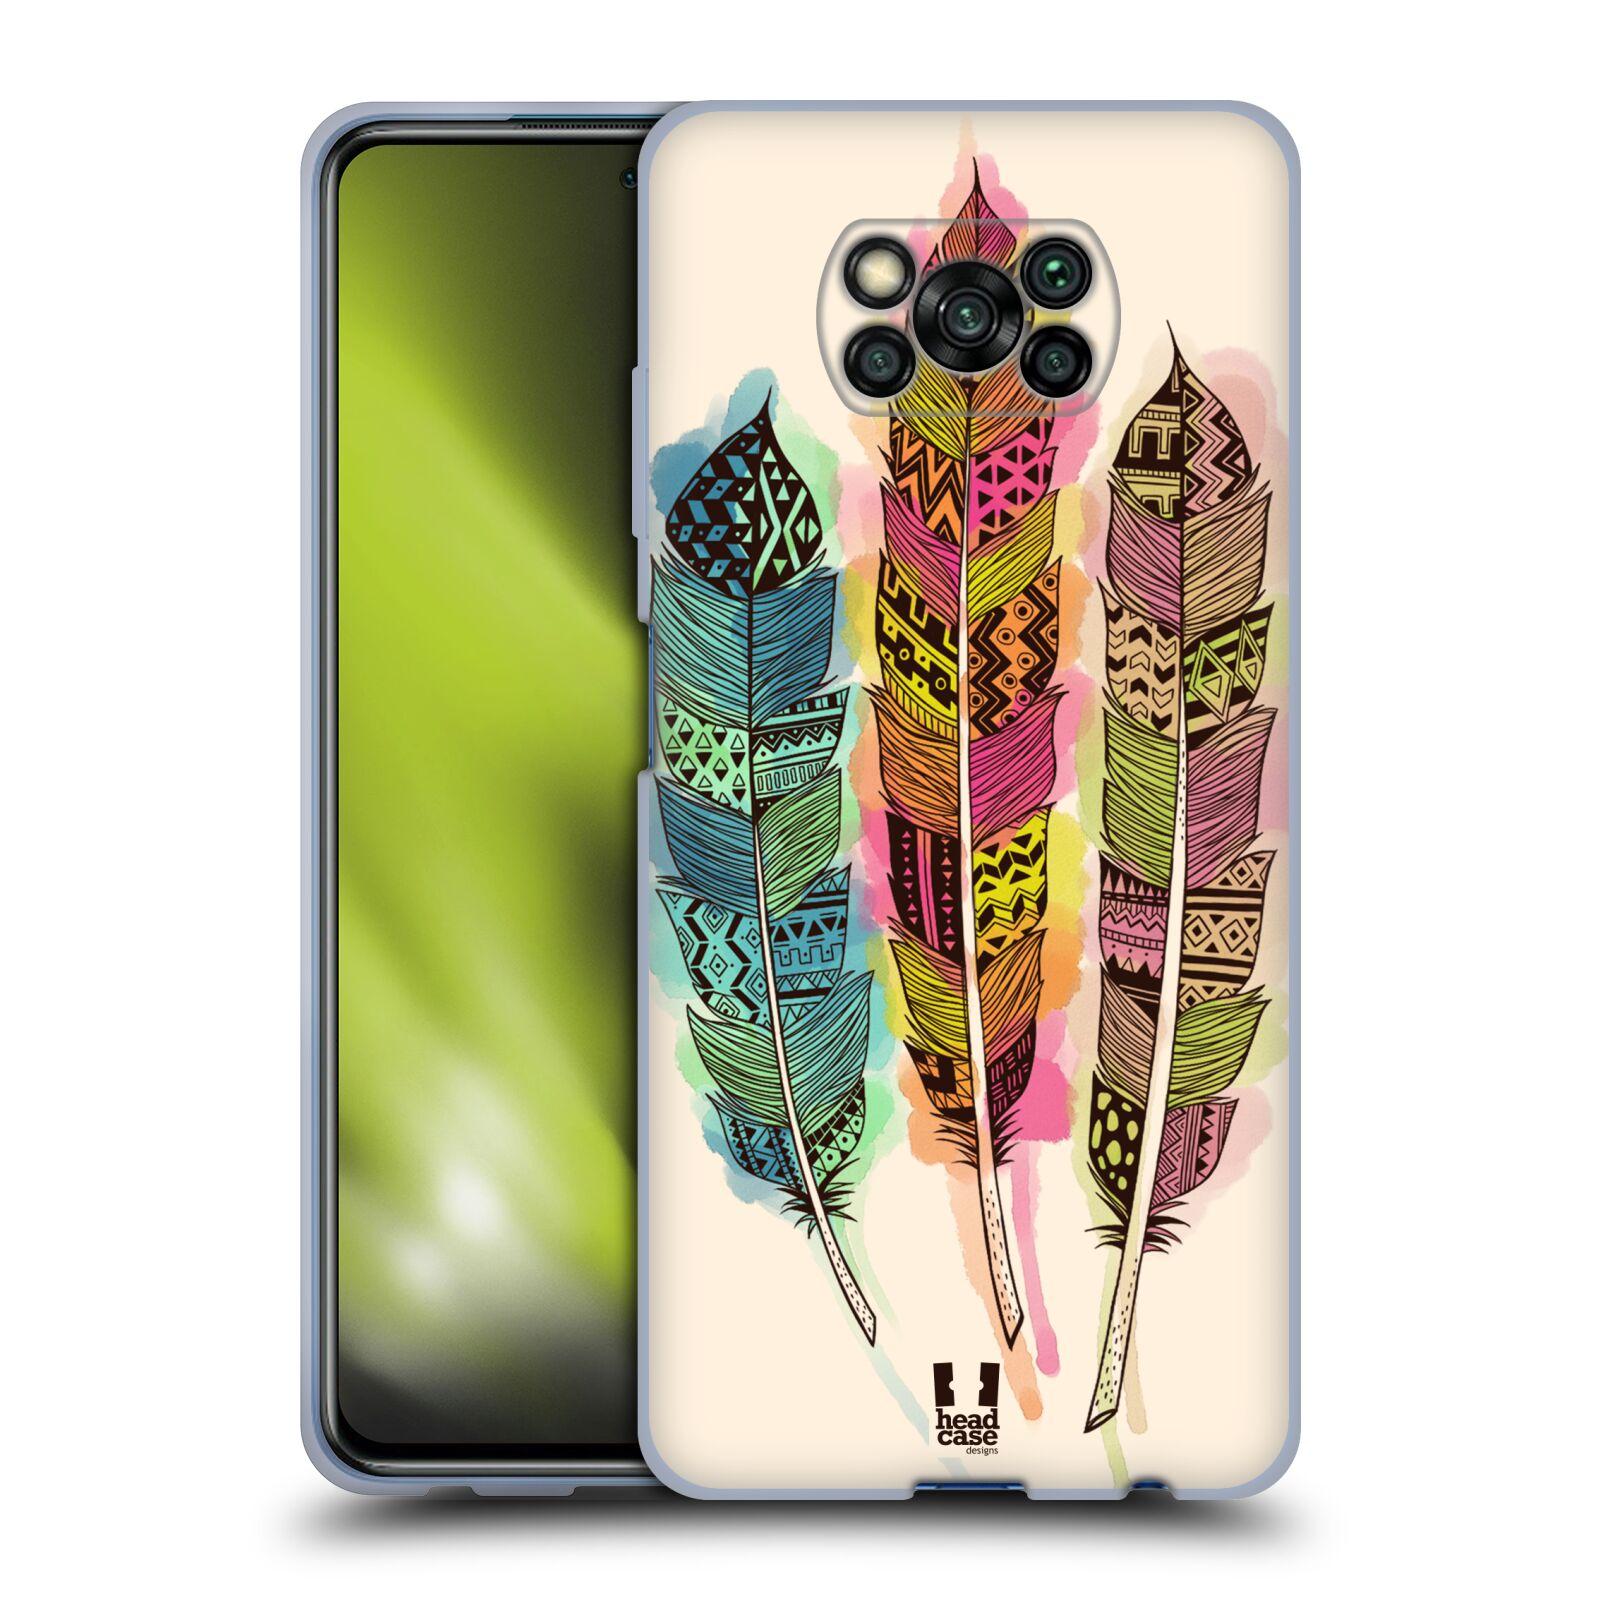 Silikonové pouzdro na mobil Xiaomi Poco X3 NFC - Head Case - AZTEC PÍRKA SPLASH